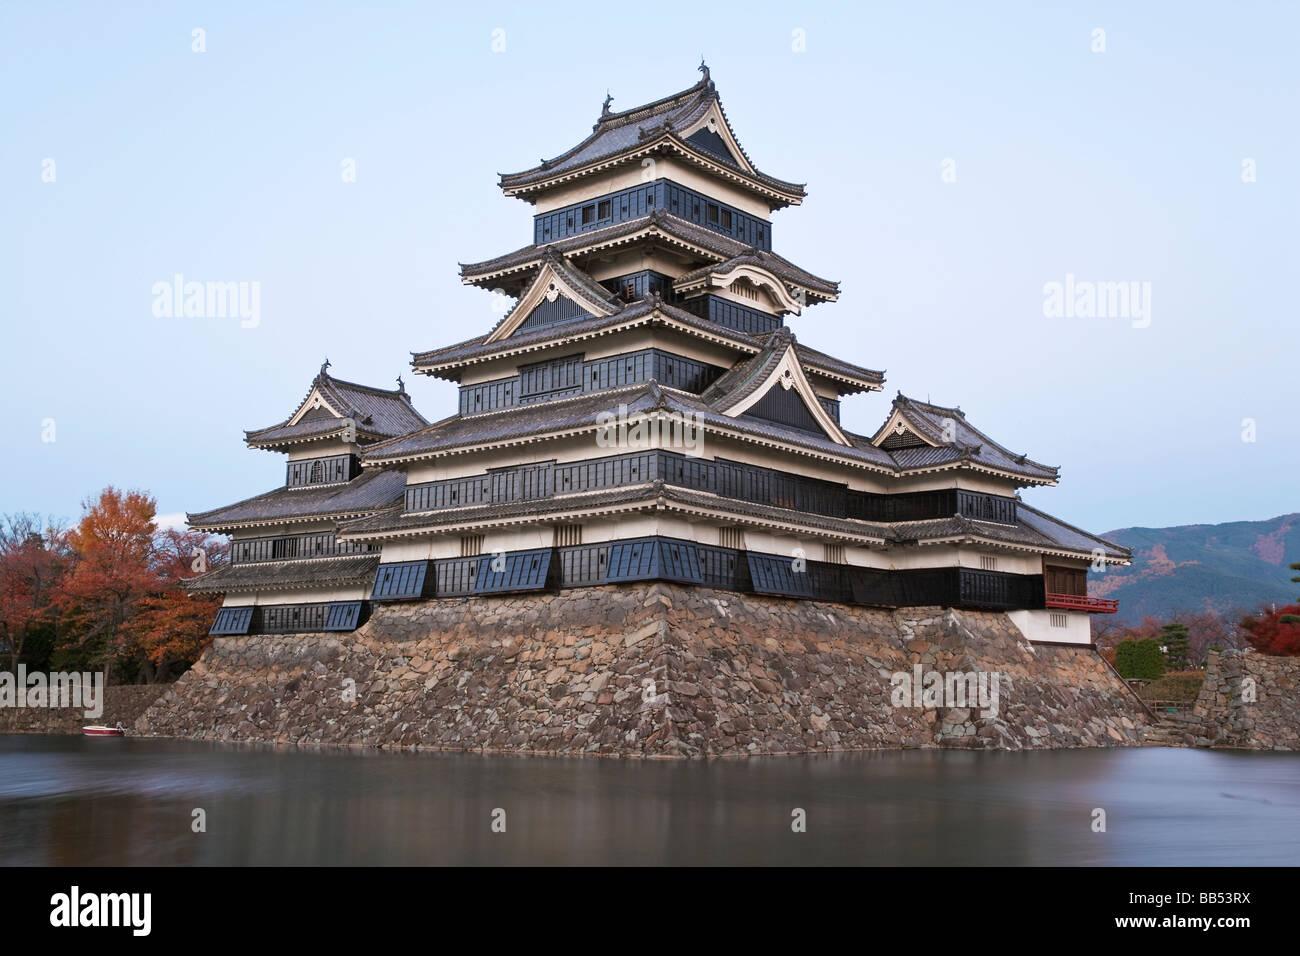 Matsumoto Castle, Matsumoto, Nagano Prefecture, Chubu, Honshu, Japan, Asia - Stock Image